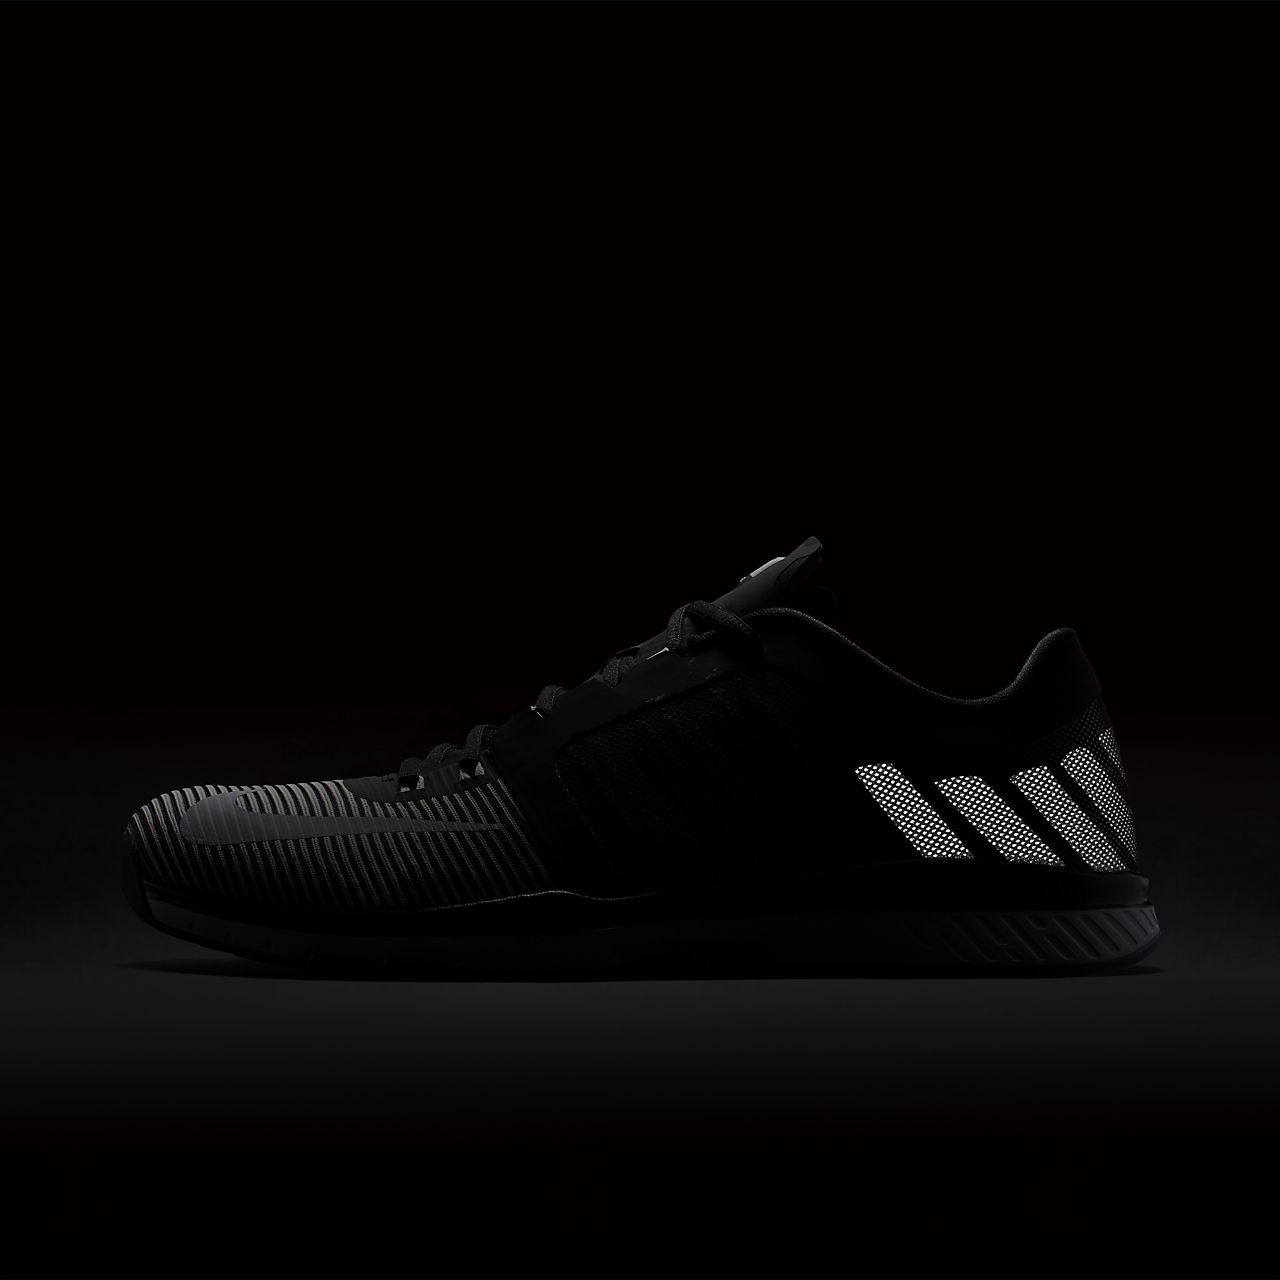 ... Nike Zoom Speed Trainer 3 Men's Training Shoe